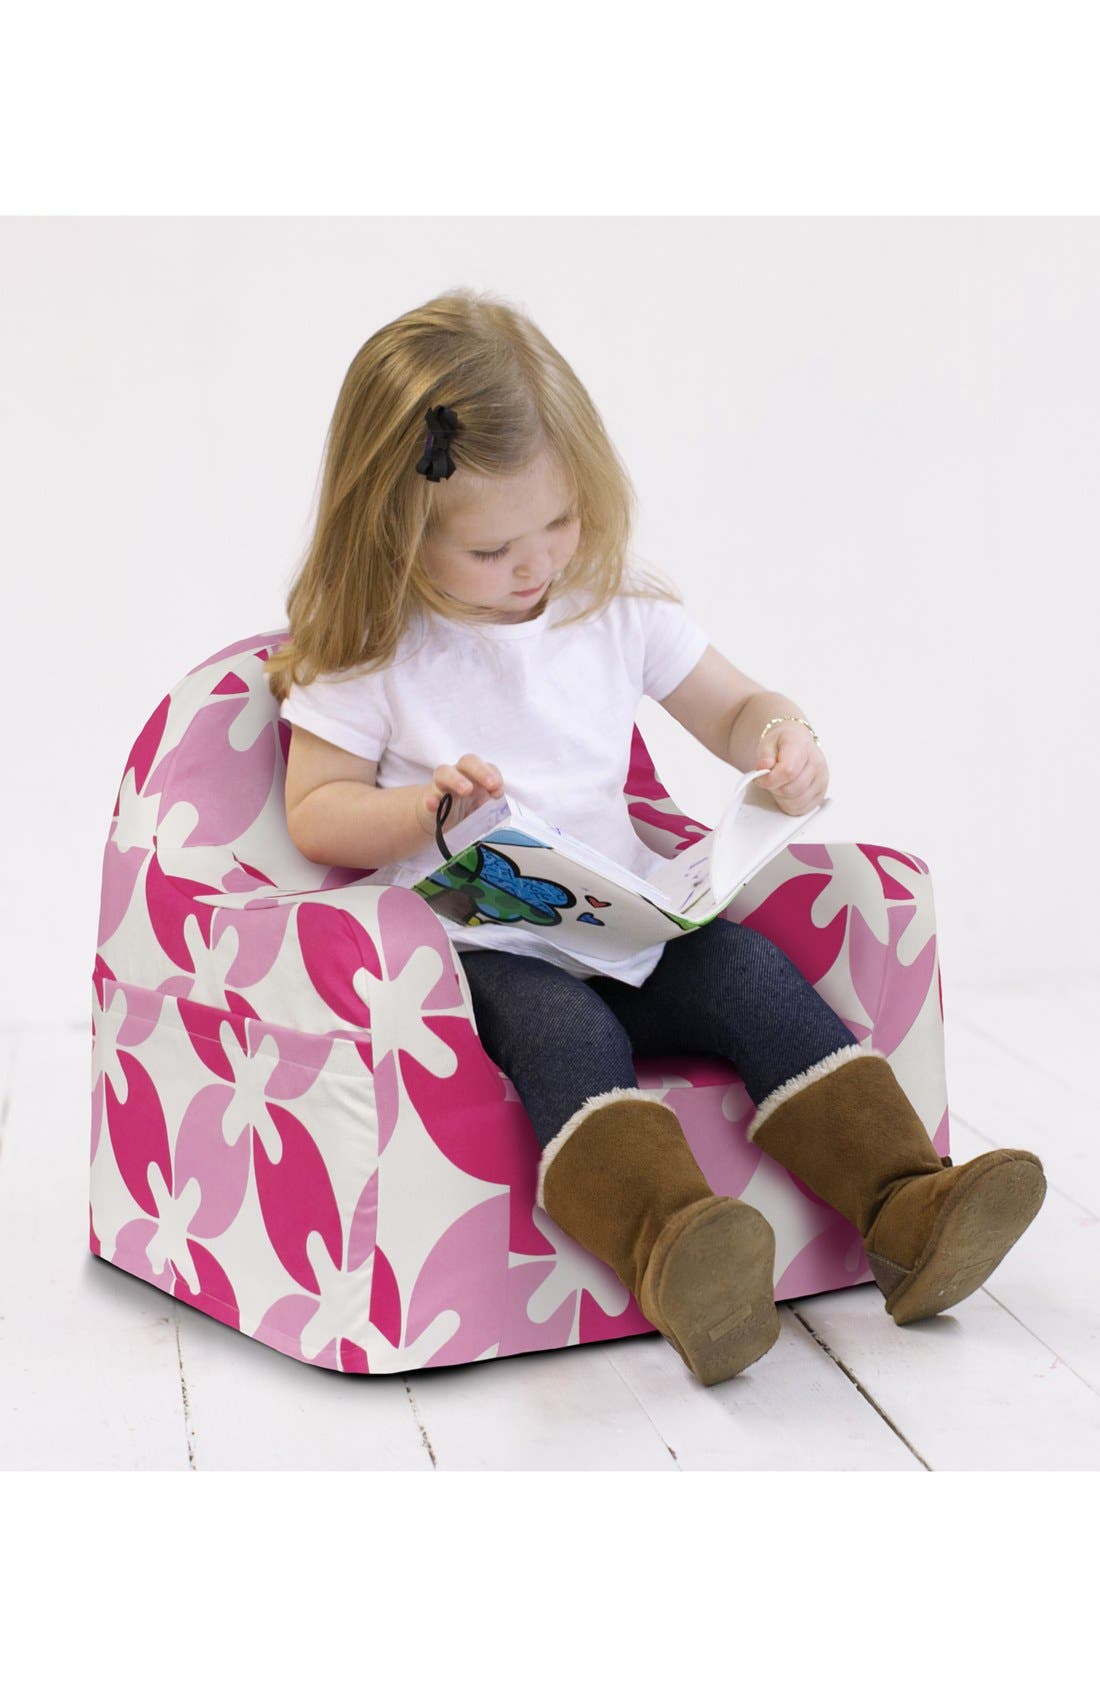 P'KOLINO,                             'Personalized Little Reader' Chair,                             Alternate thumbnail 4, color,                             650